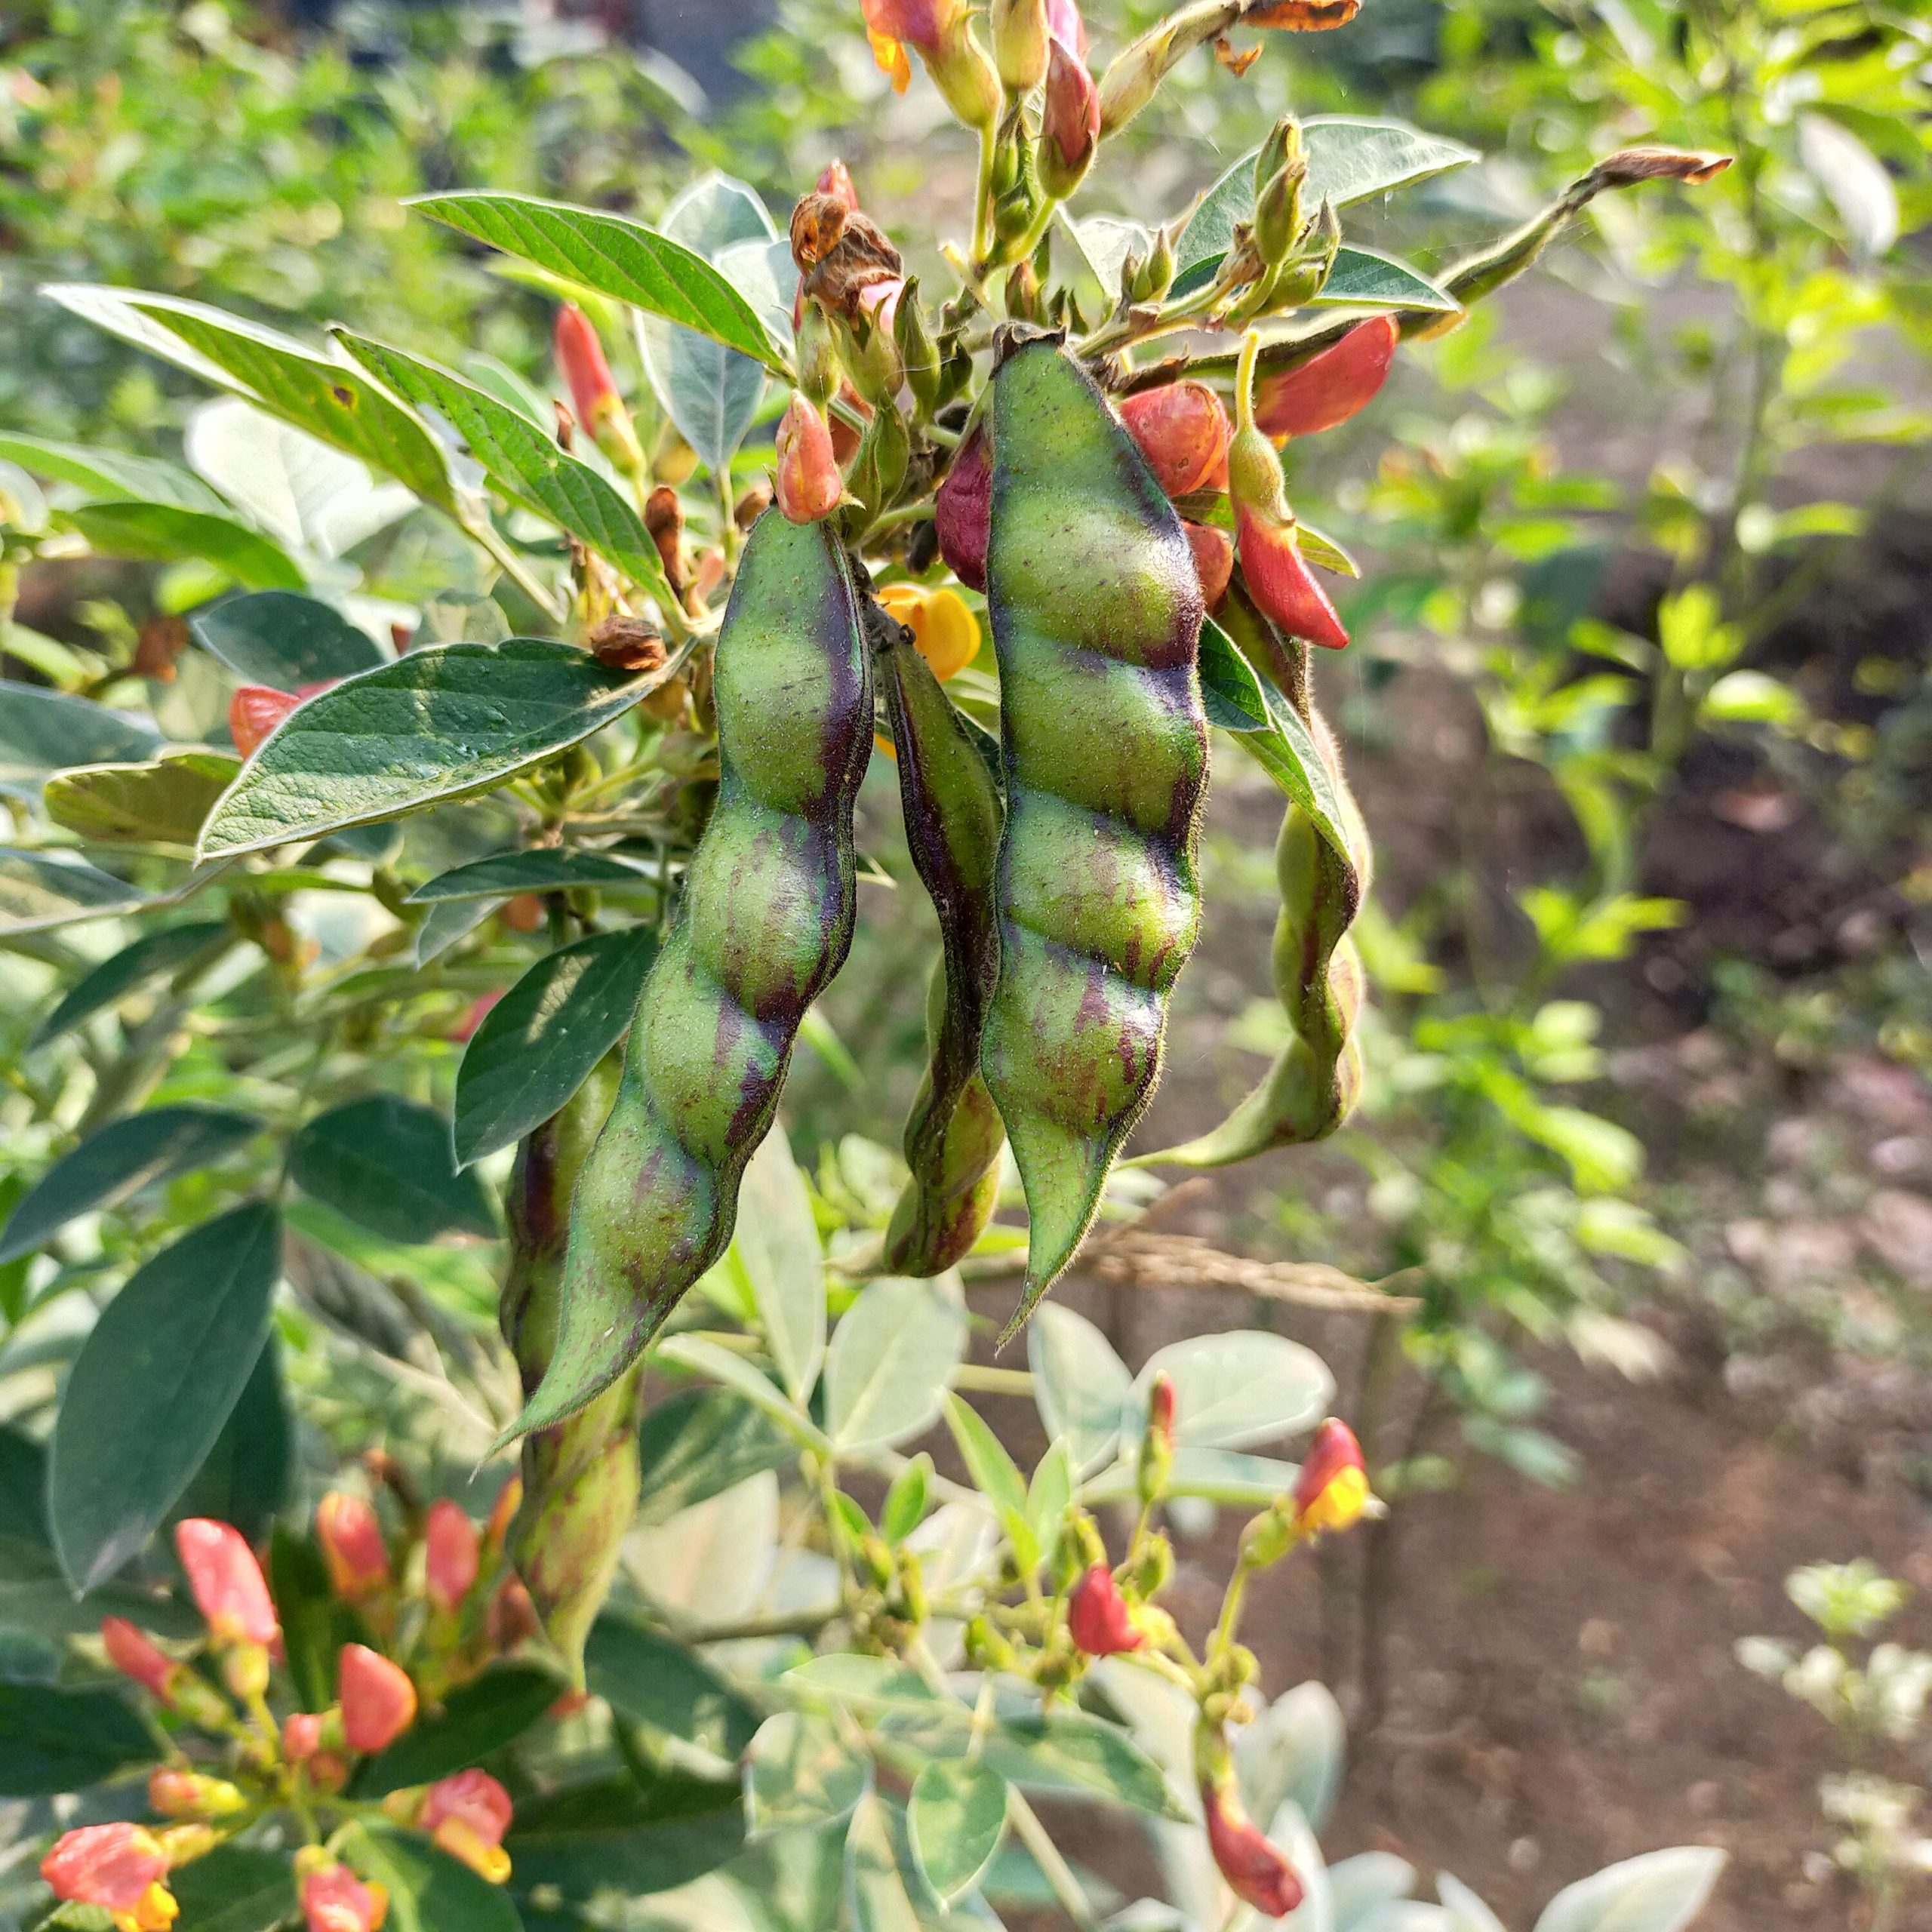 Green Bean vegetable on plant